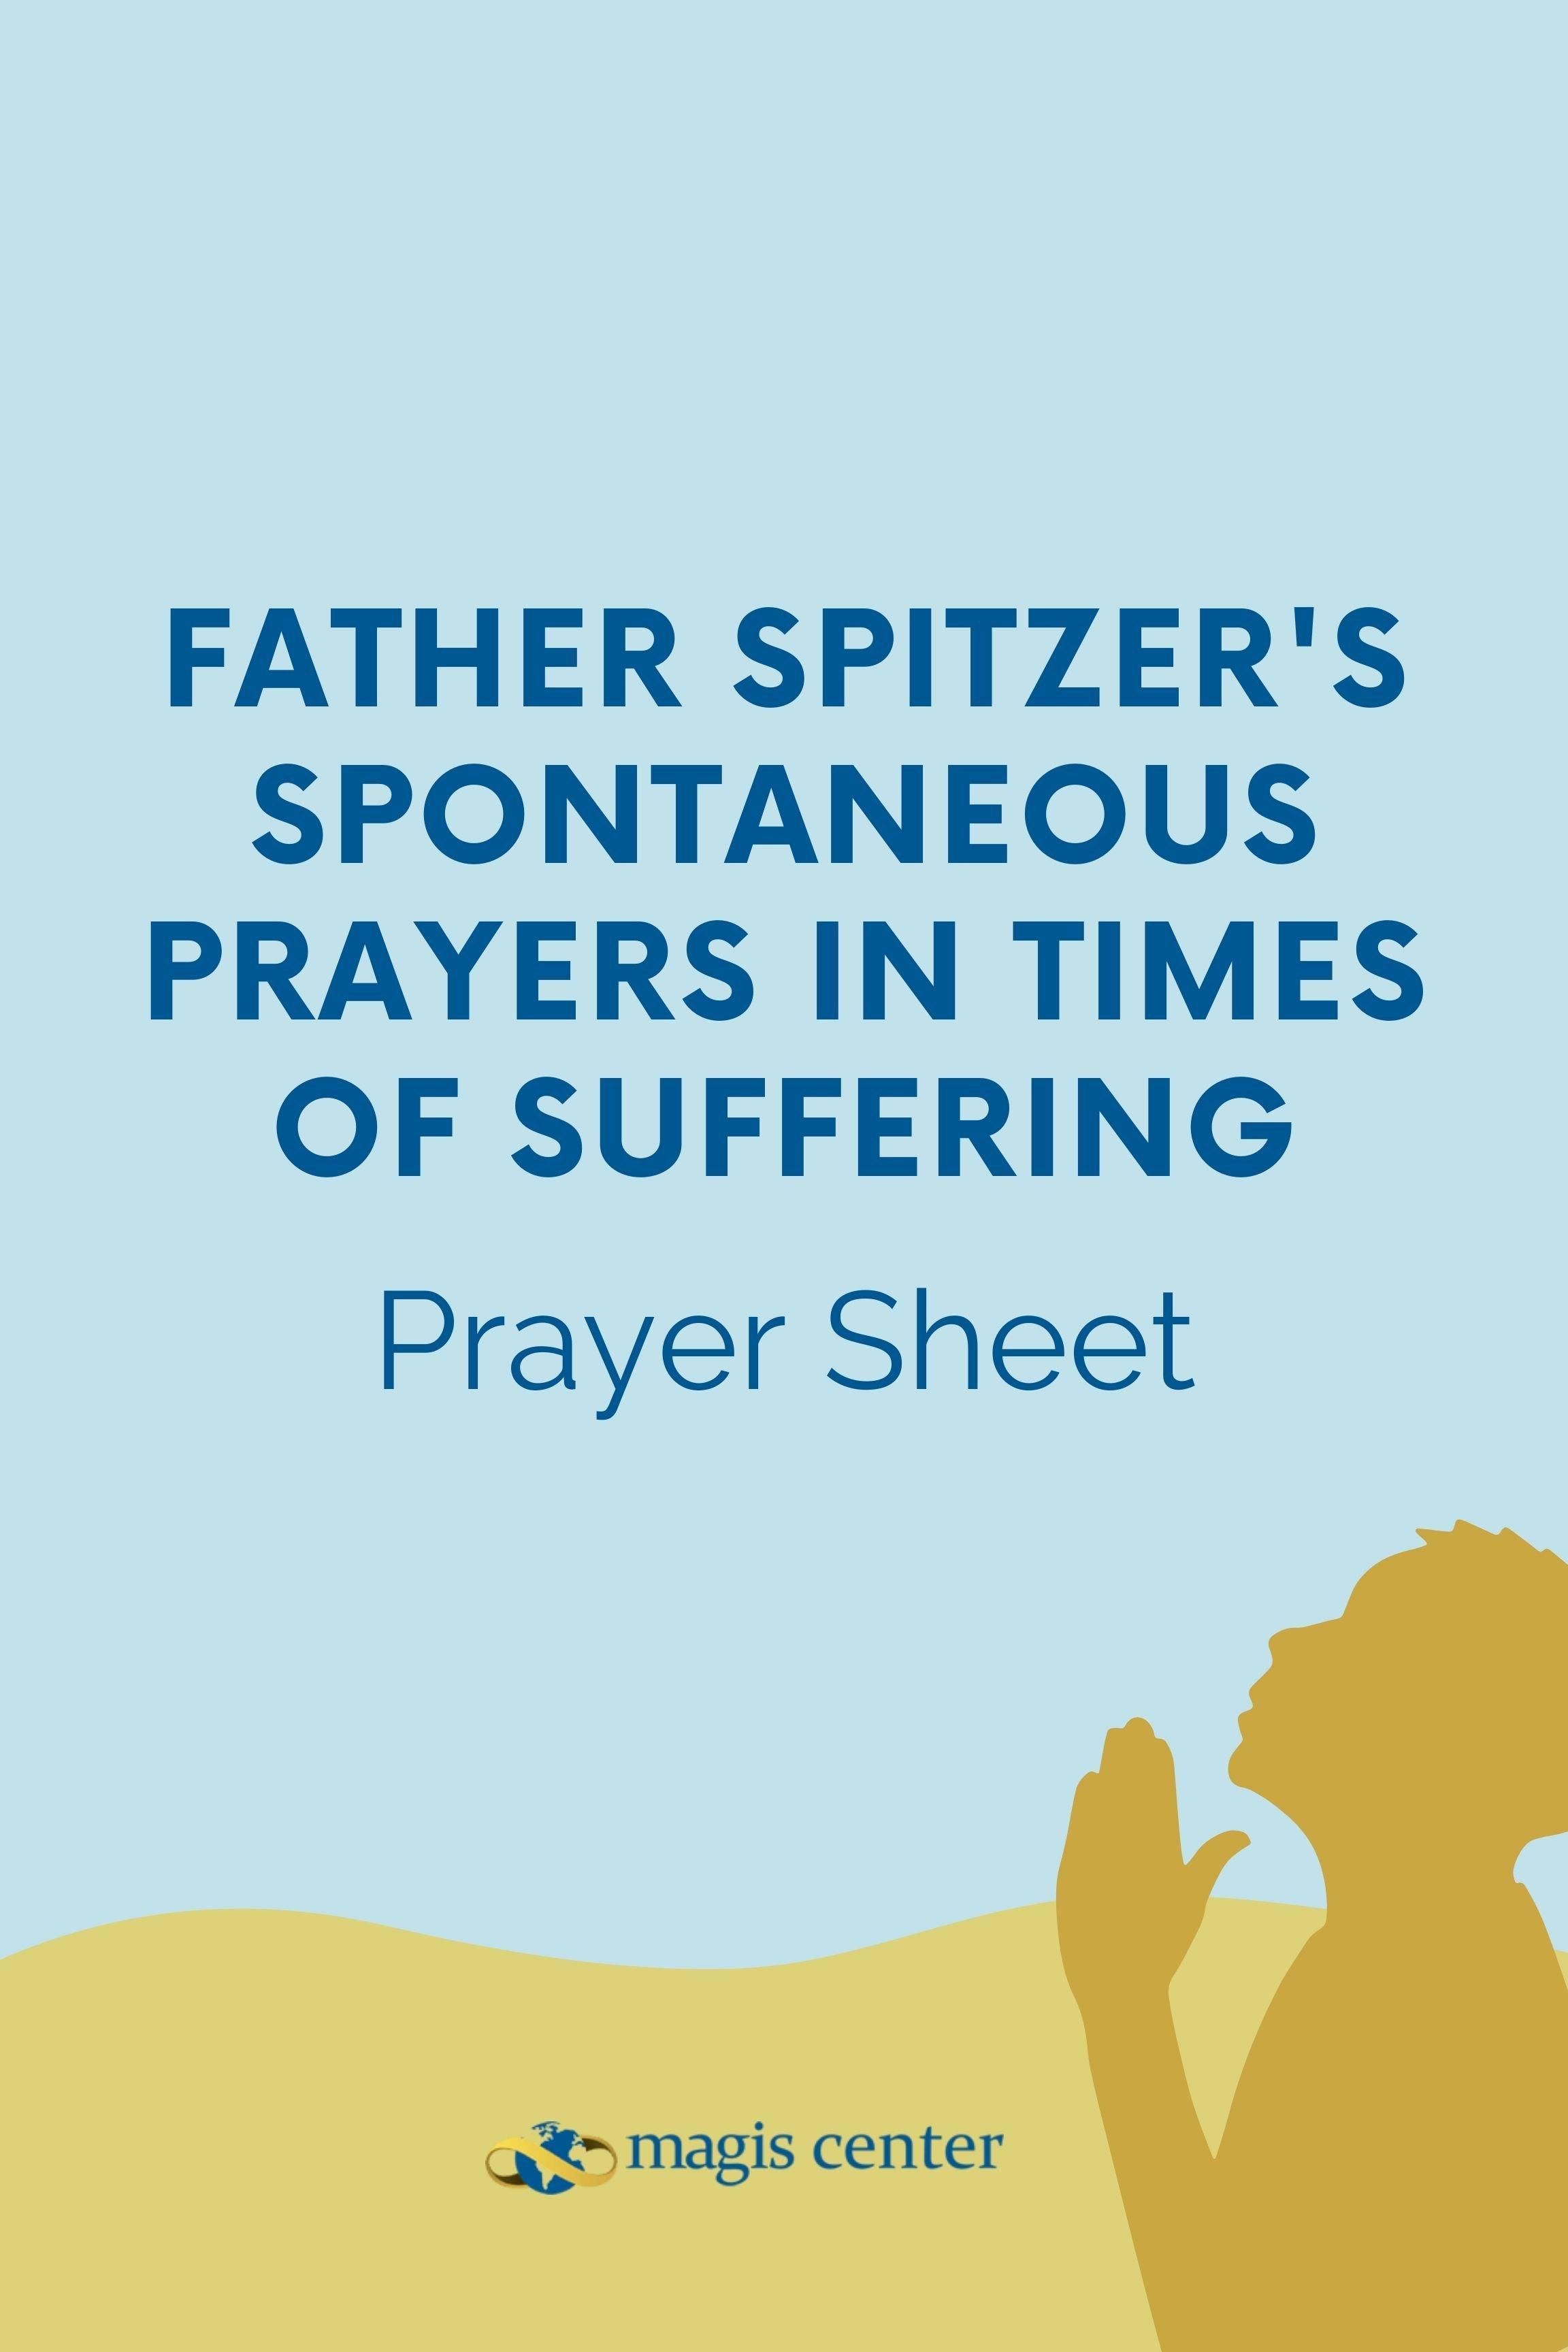 Prayer Sheet_Spontaneous Prayers in times of Suffering